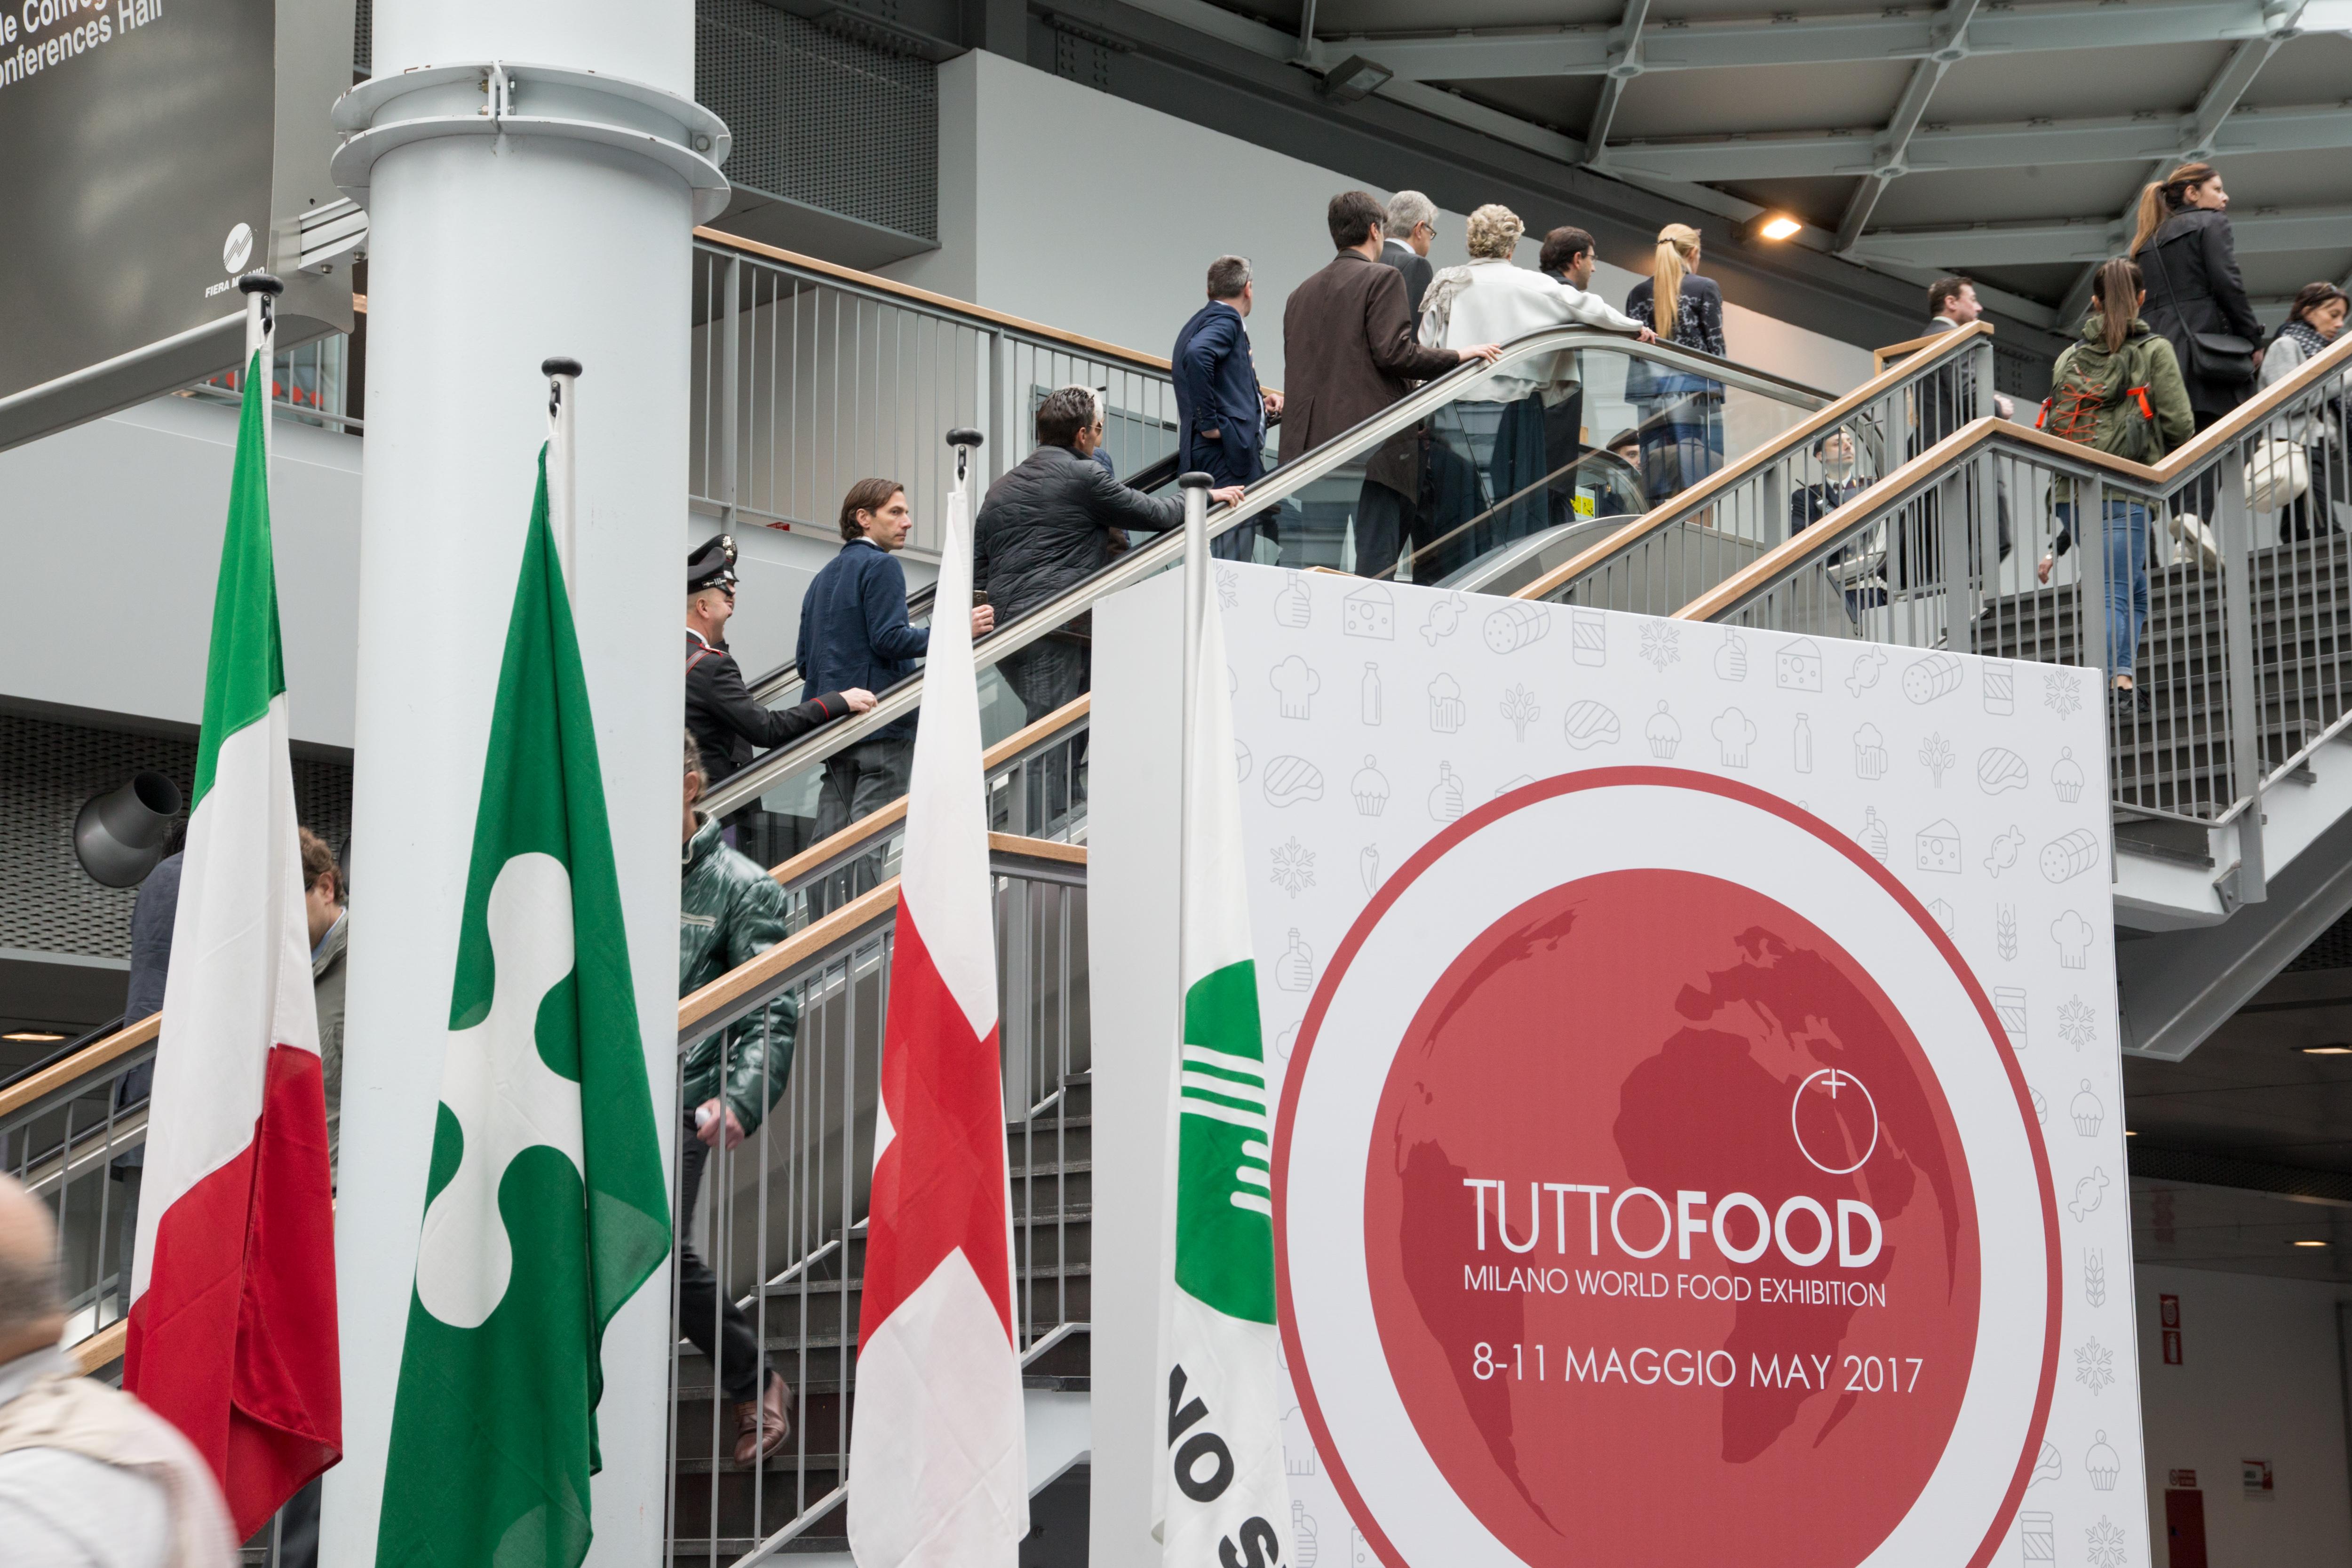 TUTTOFOOD confirms its status as international agri-food hub